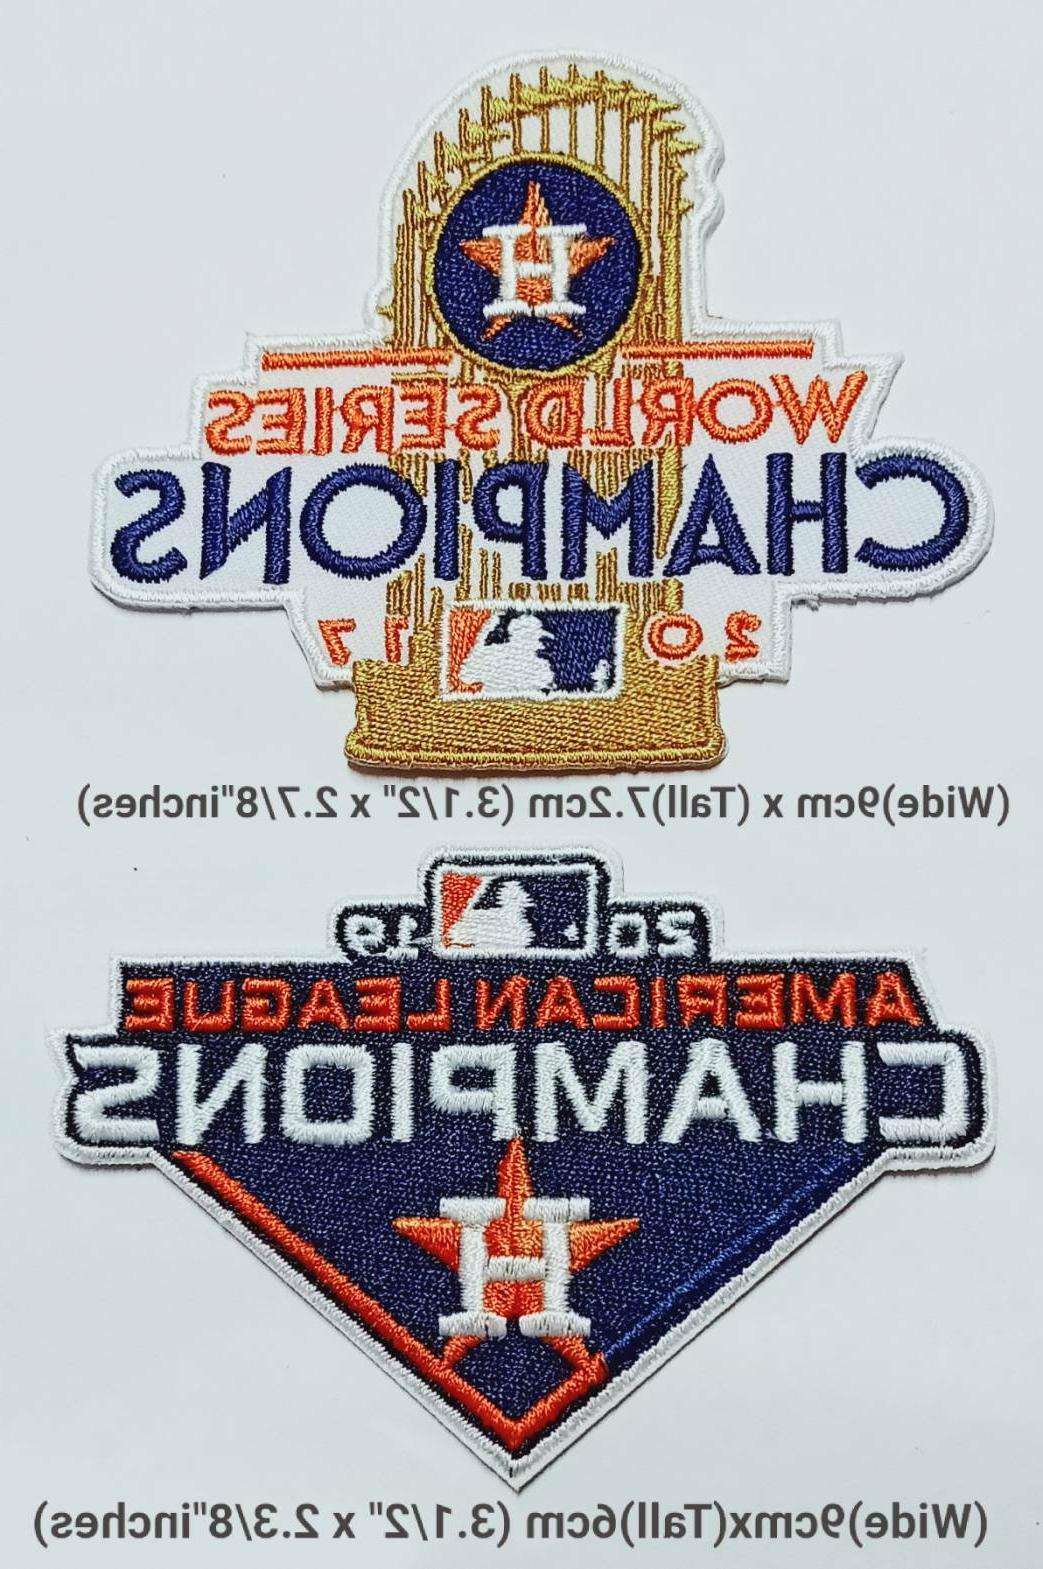 houston astros champion setbaseball sport logo patches